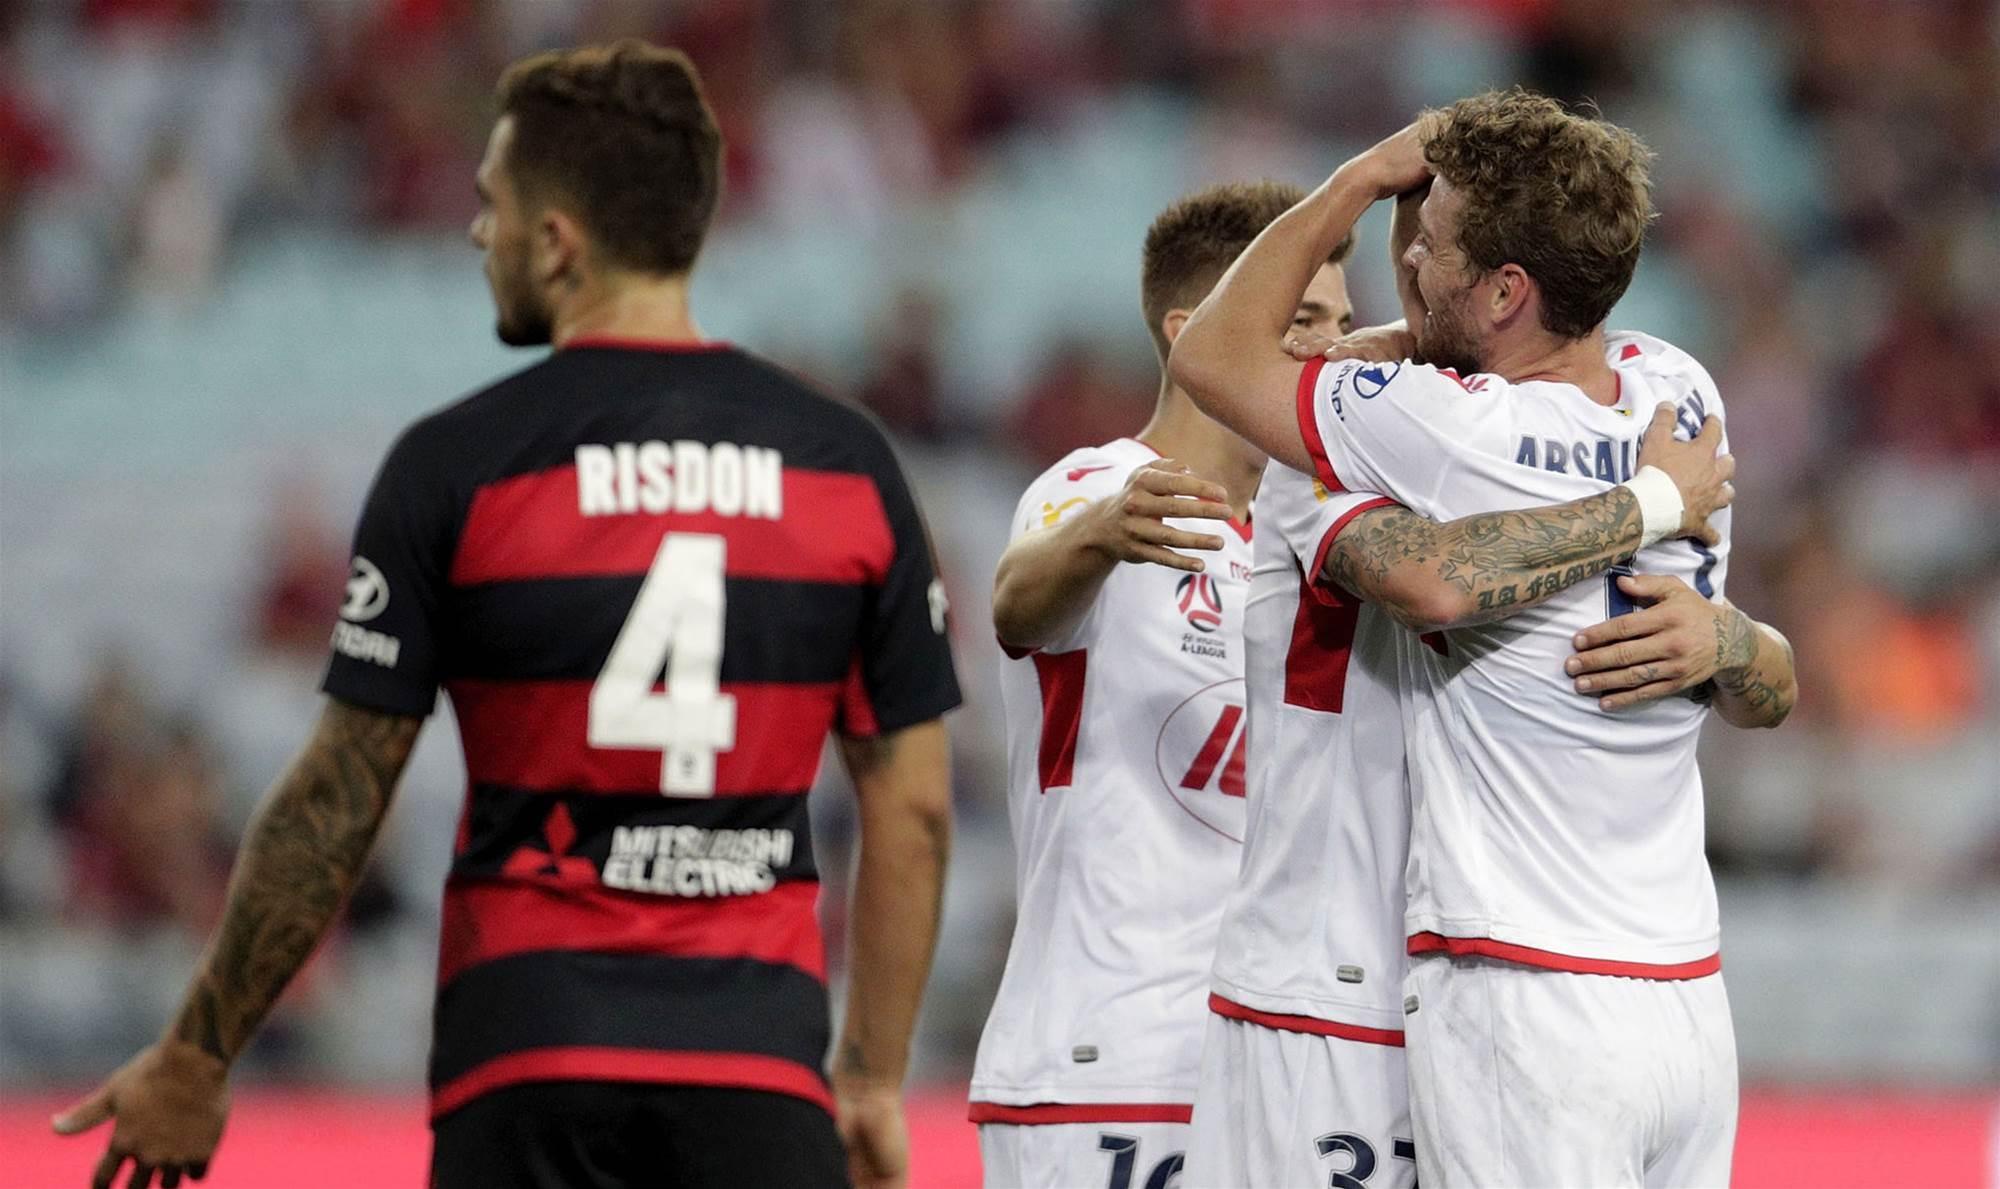 Adlung: We owed Brisbane Roar our best